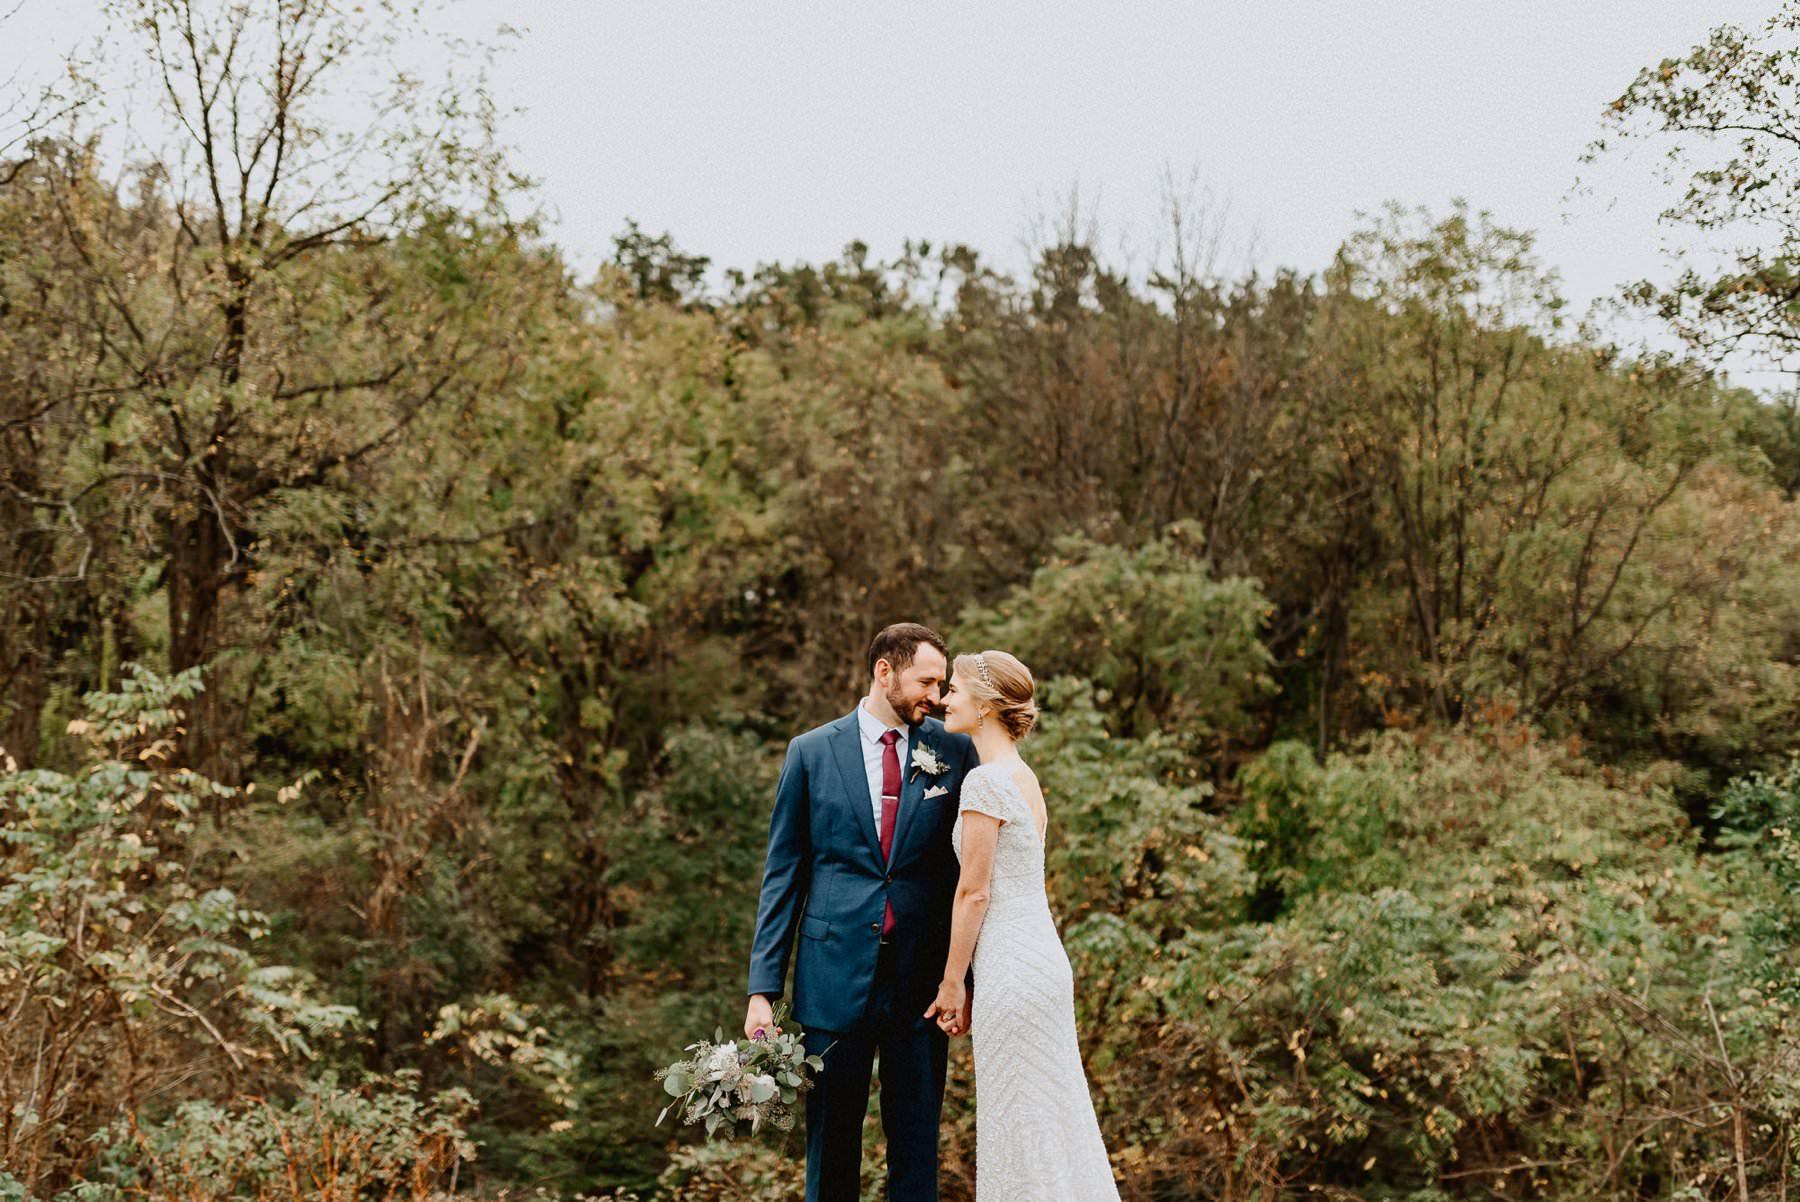 John_James_Audubon_Center_wedding-17.jpg